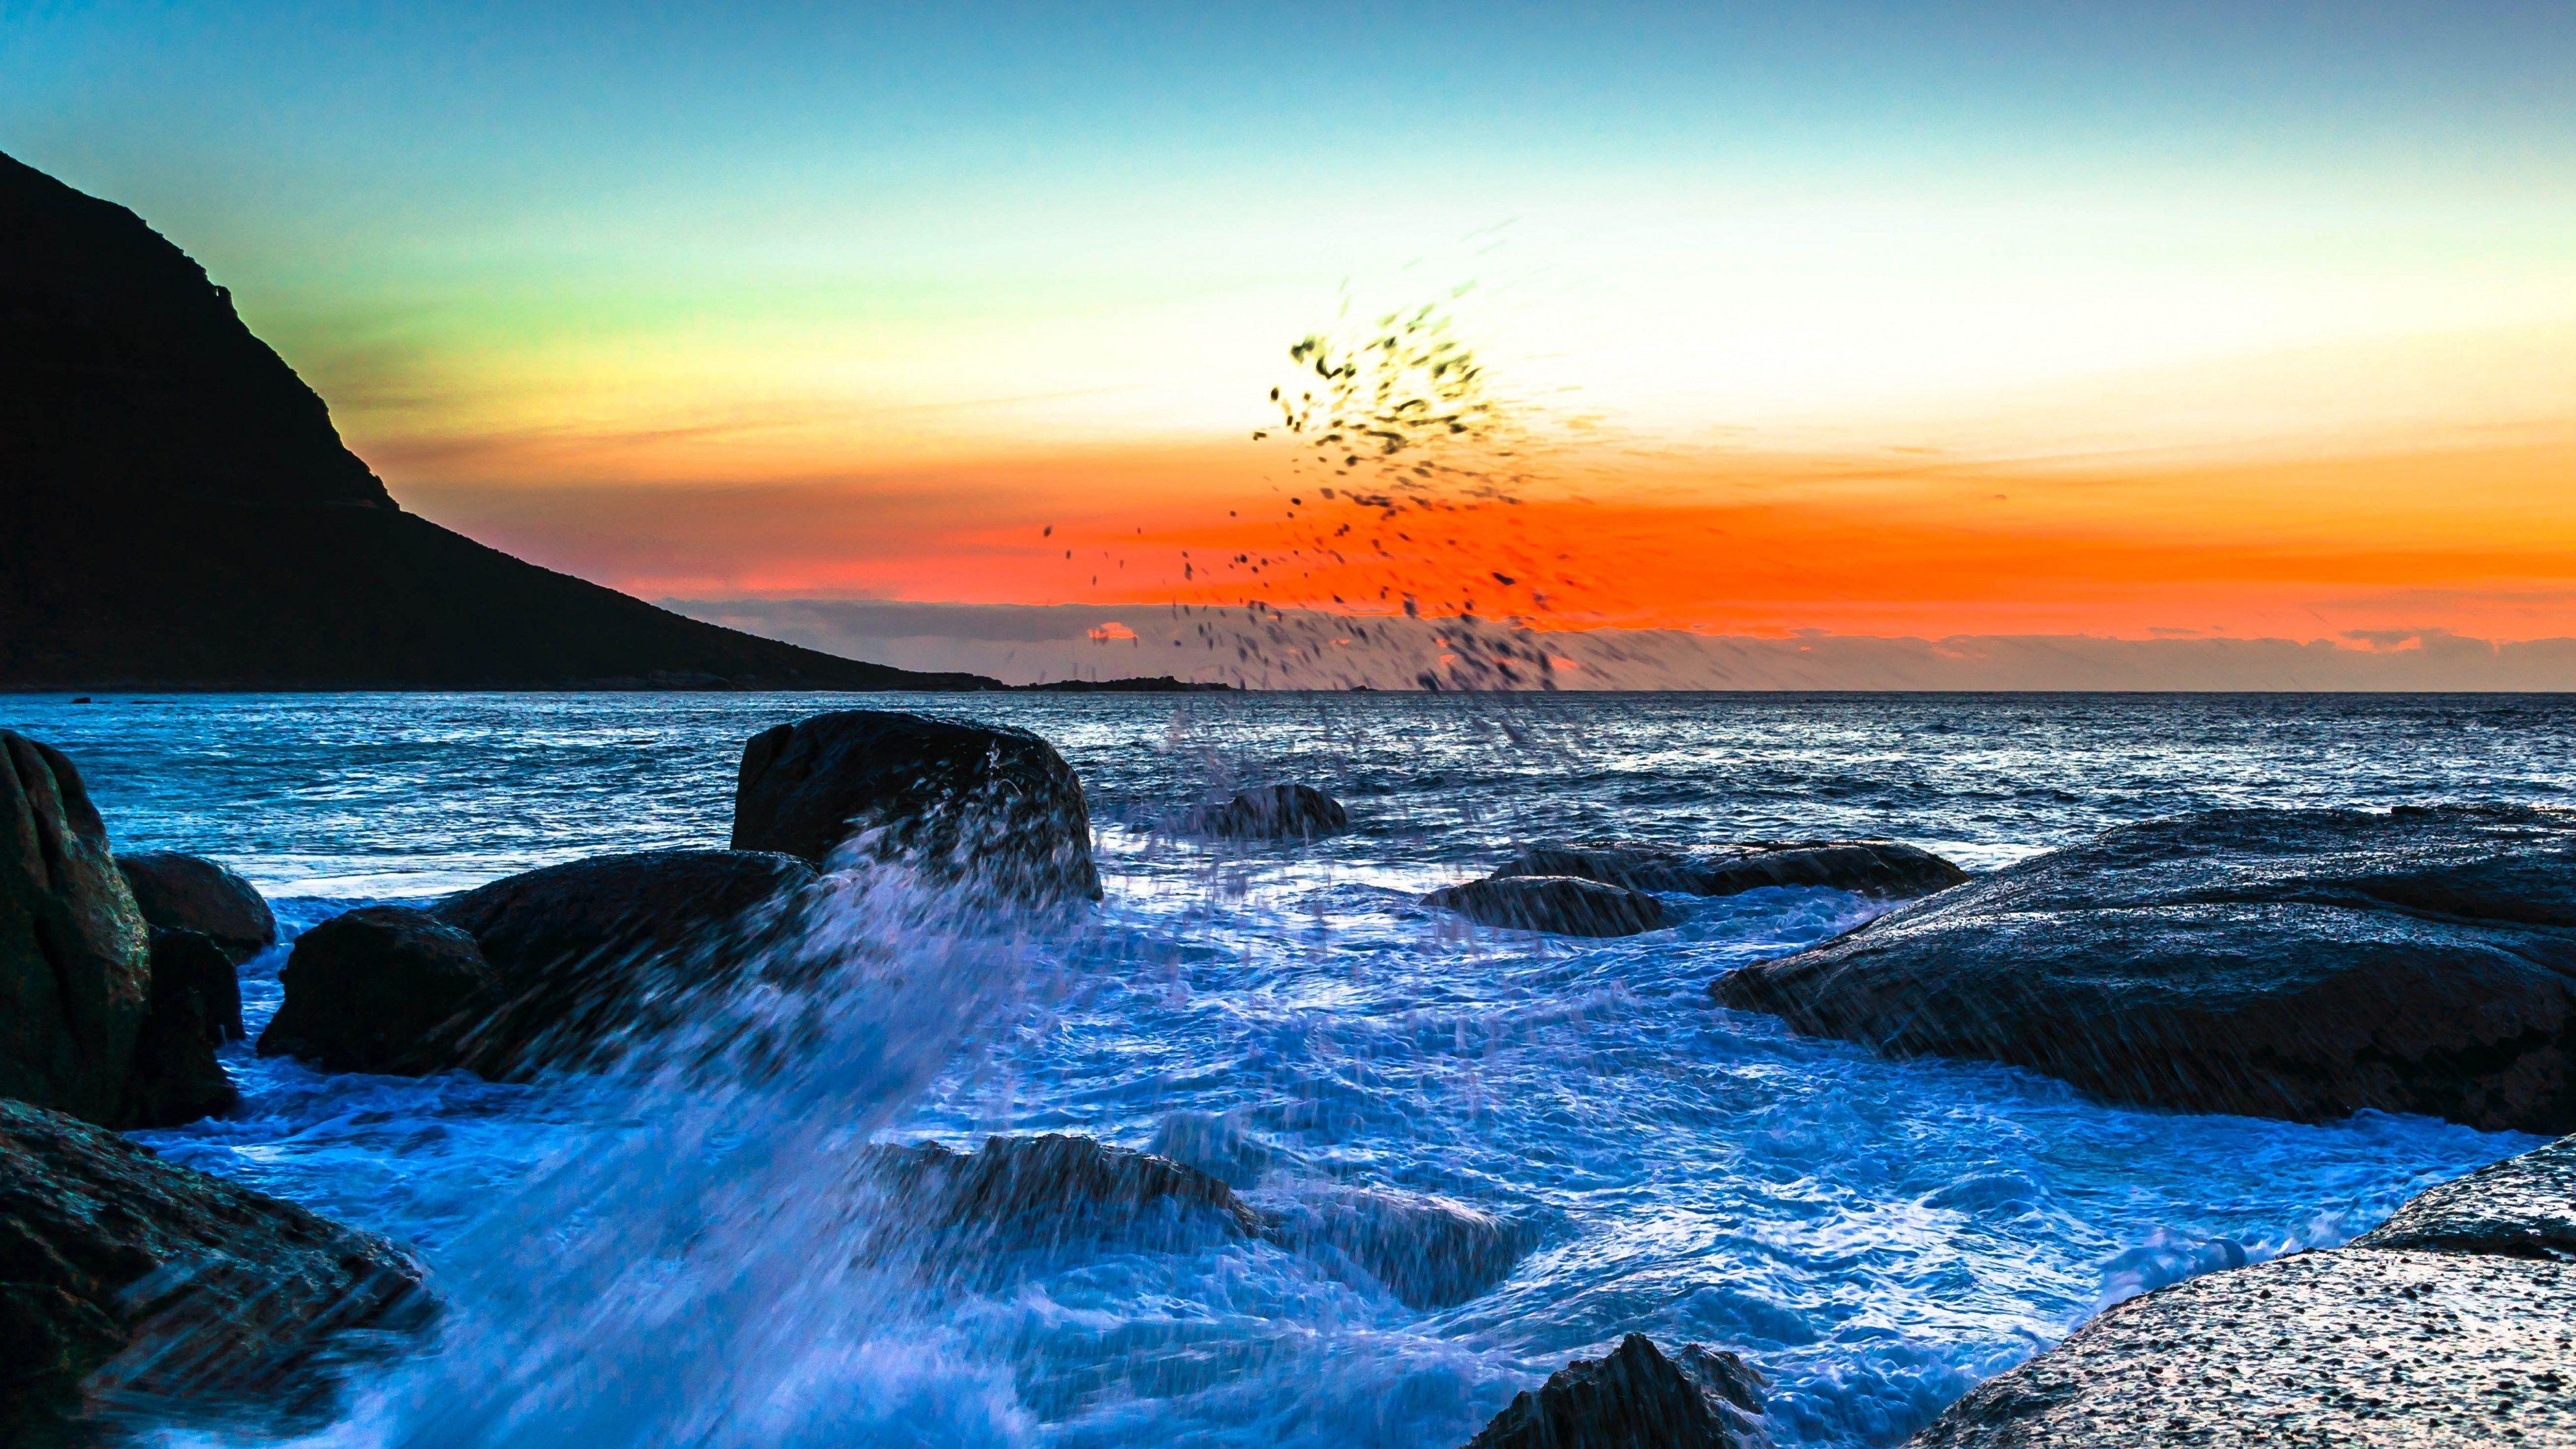 Download Wallpaper High Resolution Ocean - 8490e899b492a0a0dad977d22b0203f9  Image_488160.jpg